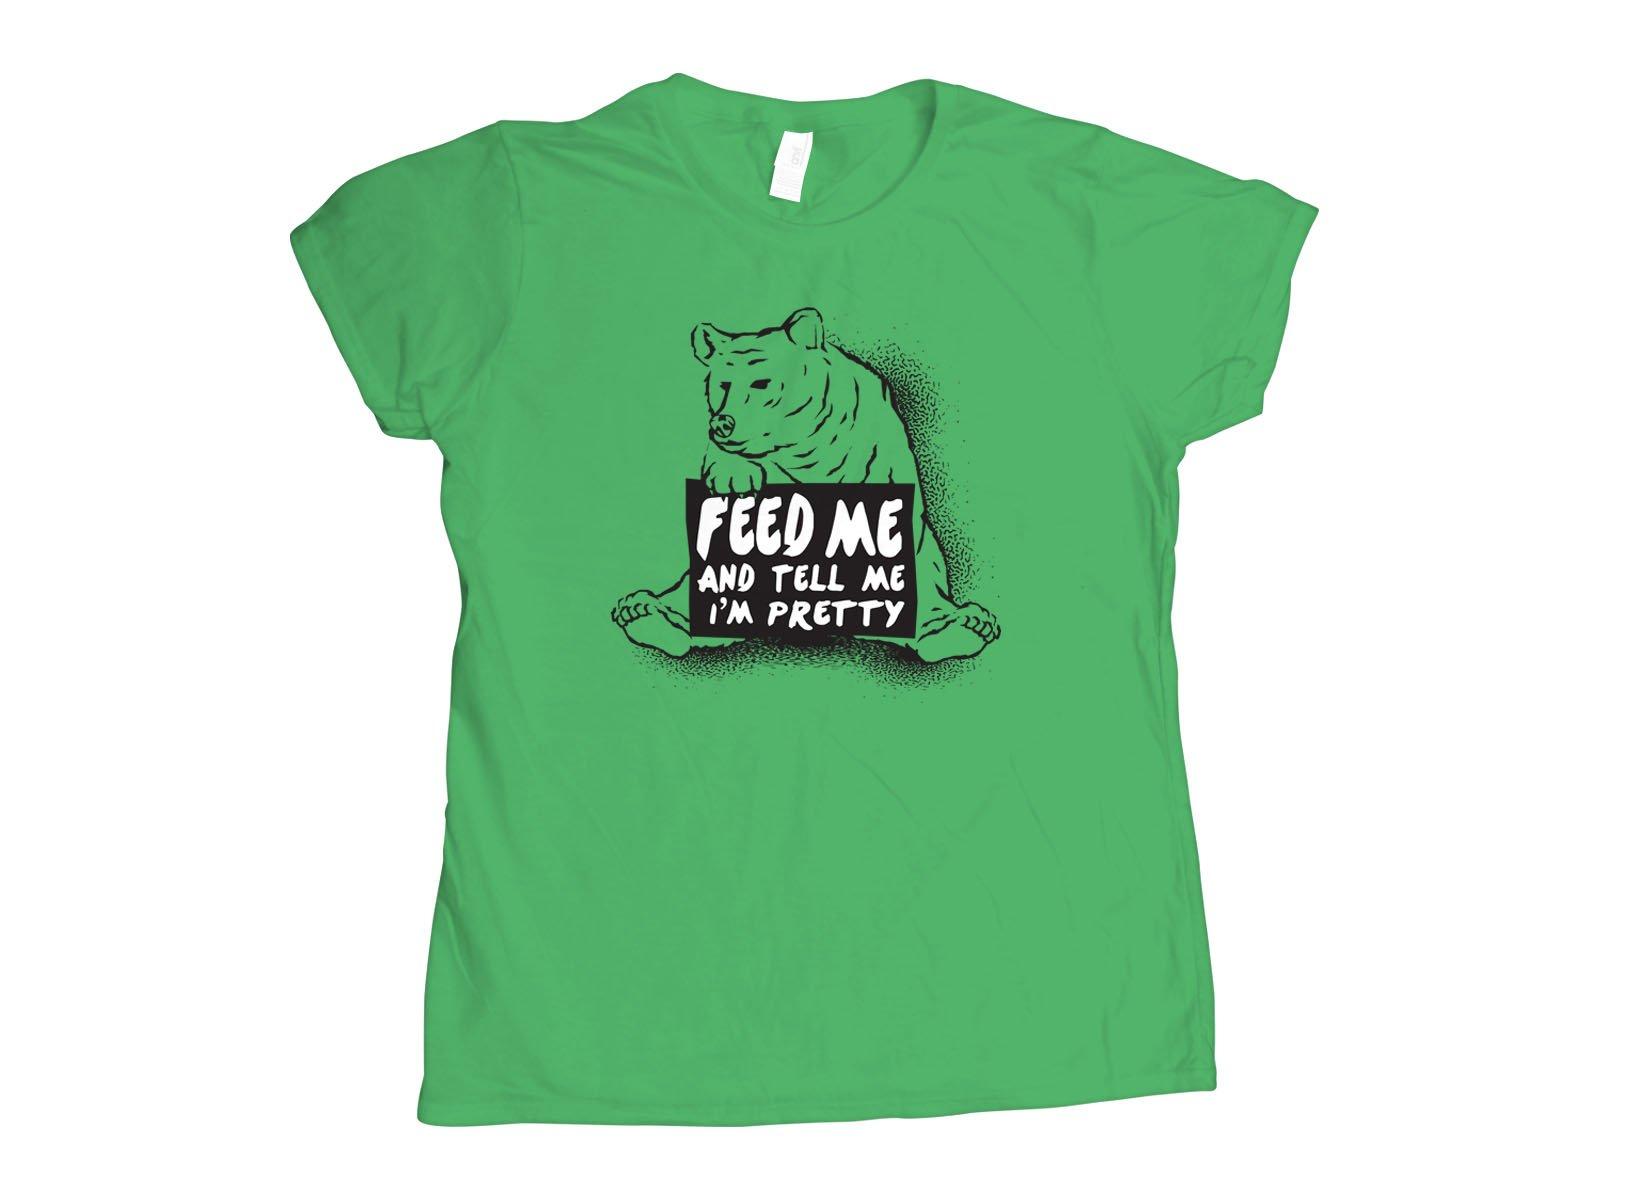 Feed Me on Womens T-Shirt